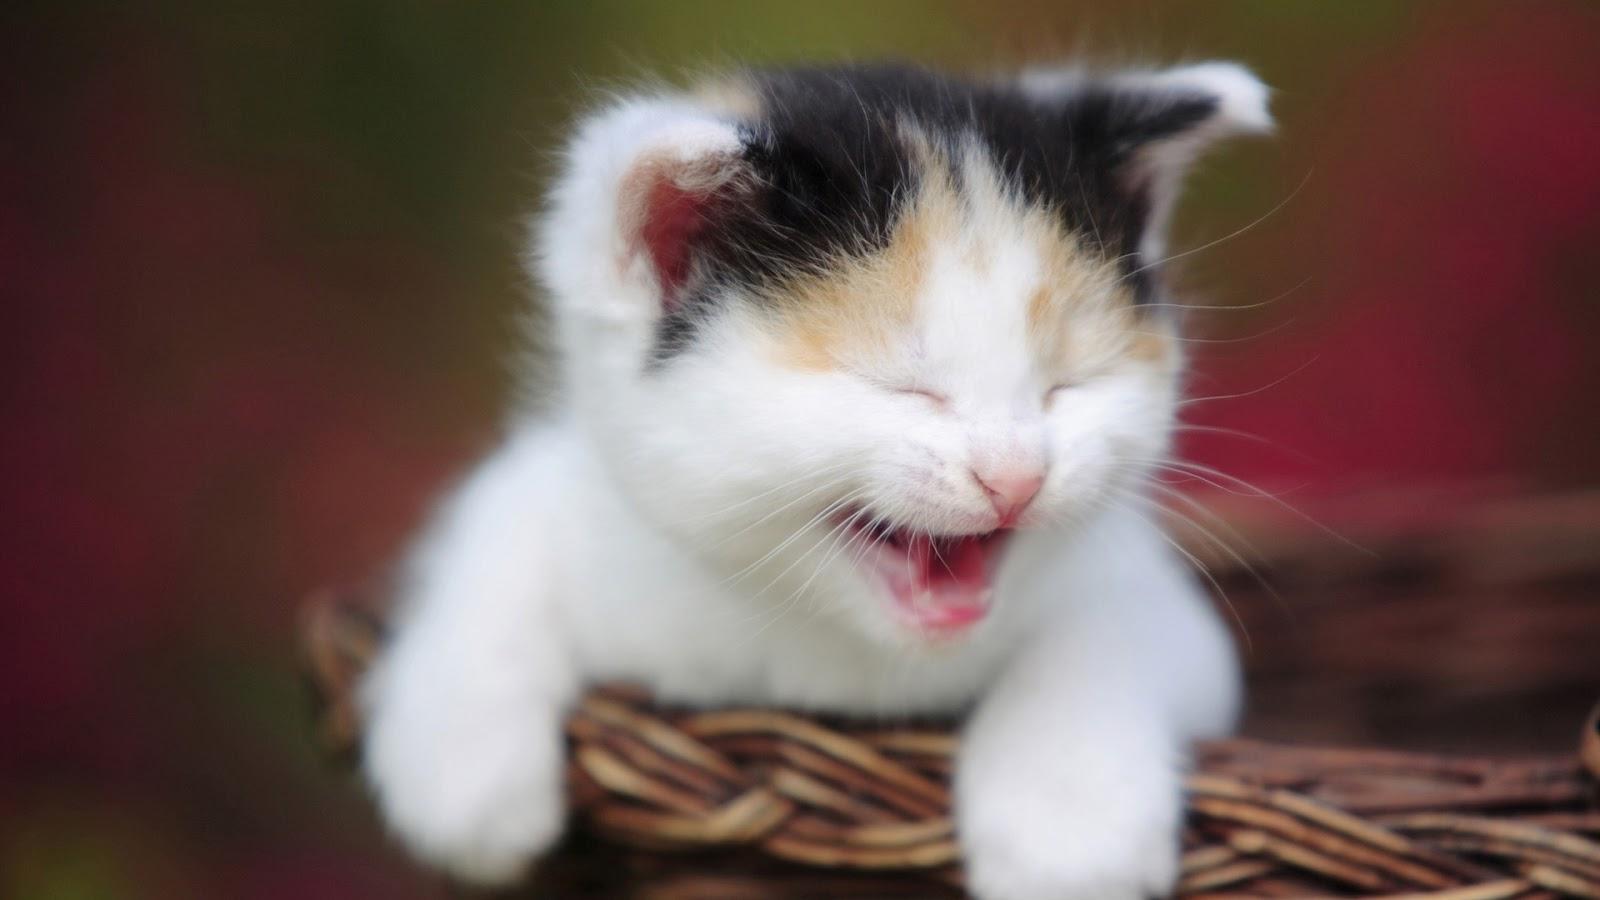 Free Download Baby Cat Wallpaper 1 Baby Cat Wallpaper 2 Baby Cat Wallpaper 3 Baby 1600x900 For Your Desktop Mobile Tablet Explore 76 Baby Kitten Wallpaper Cute Kittens Wallpapers